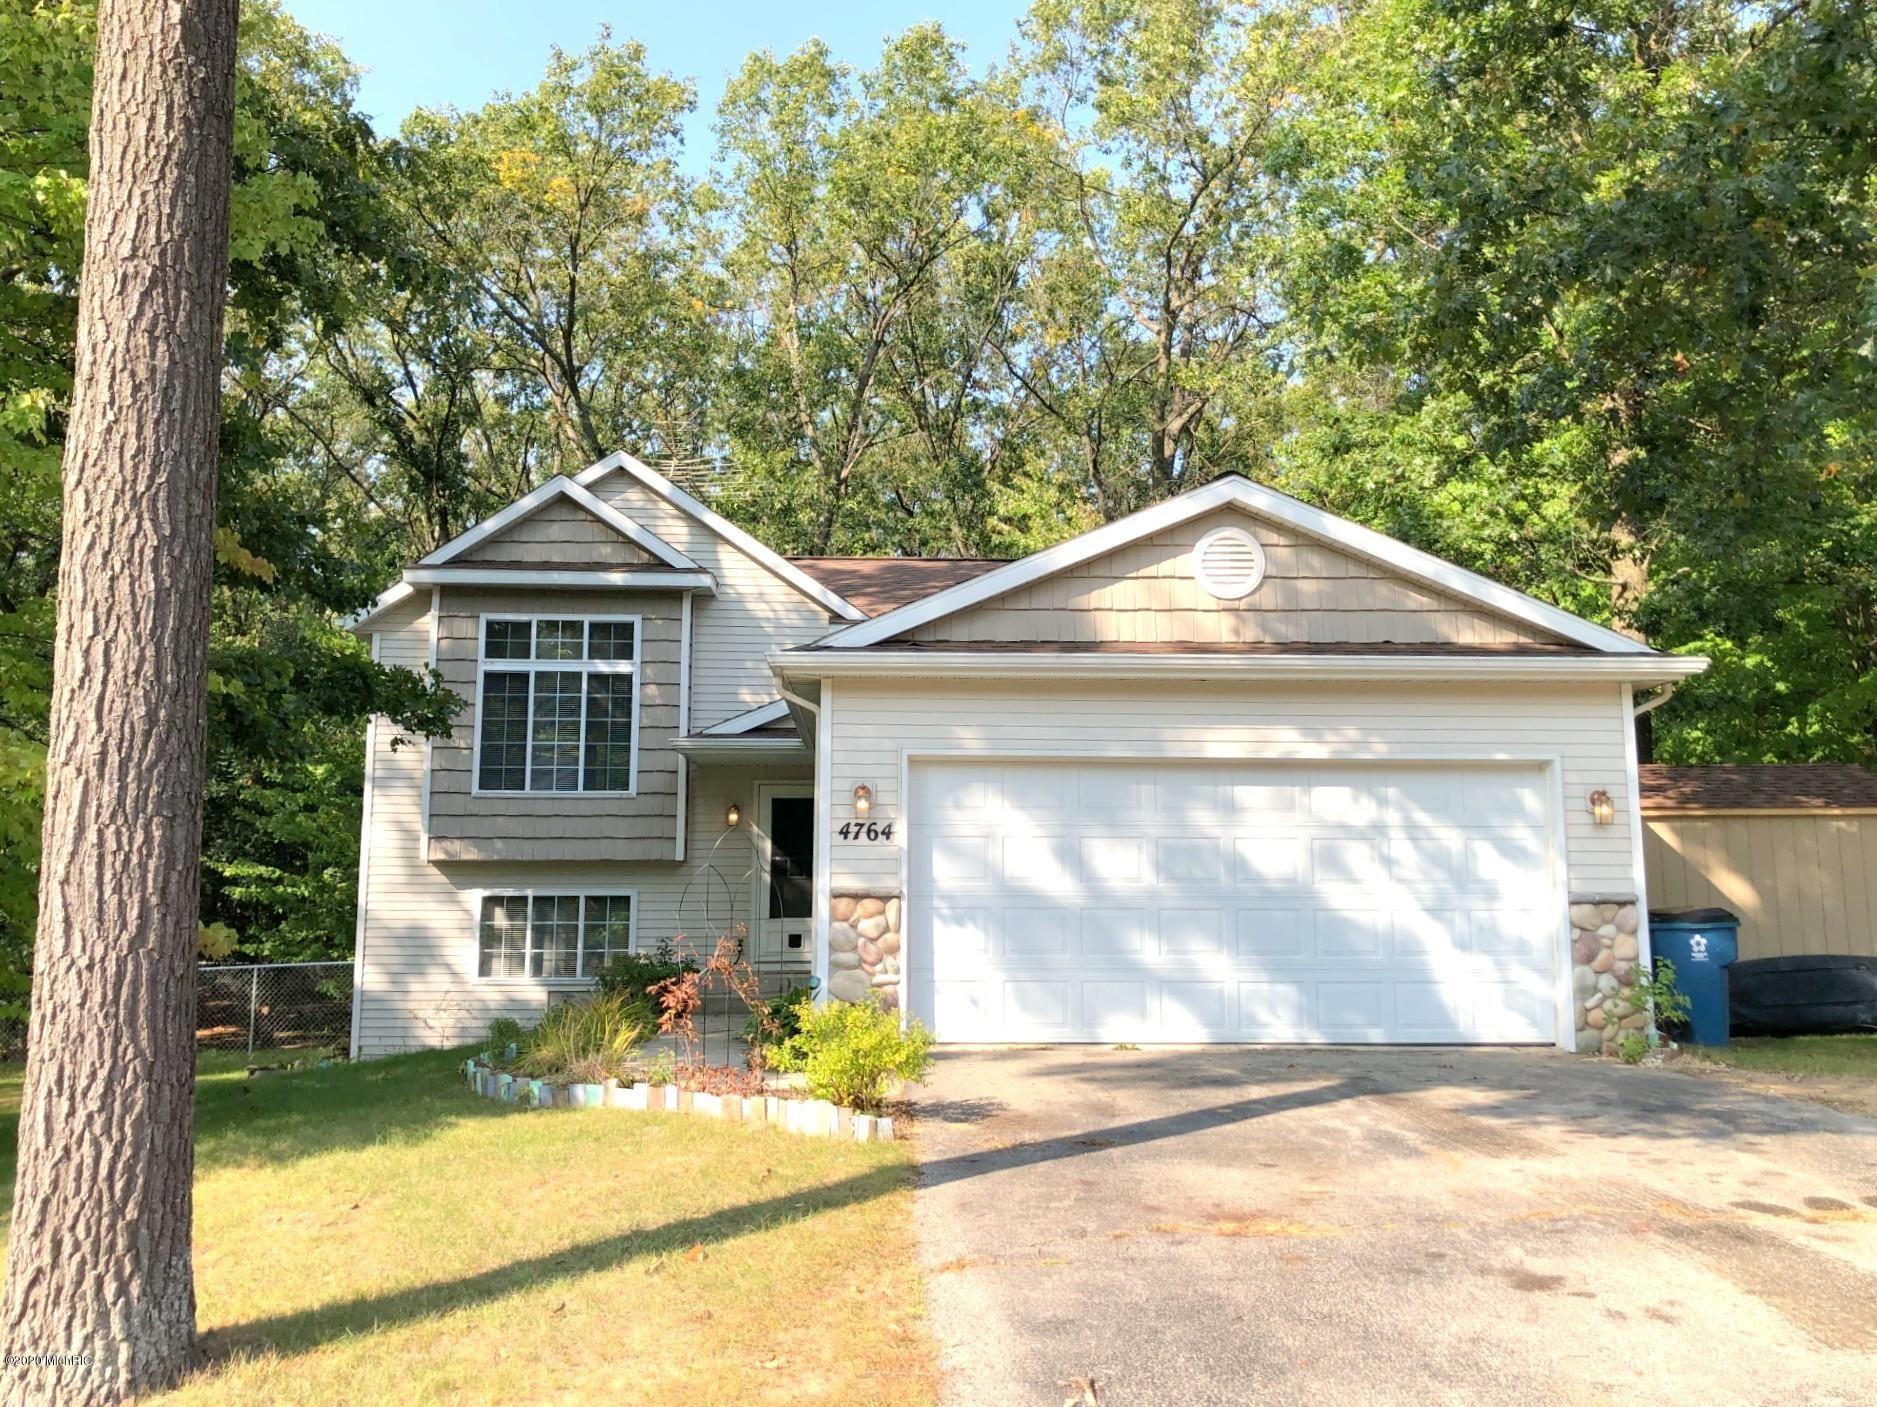 4764 Whitefish Woods Drive, Pierson, MI 49339 - MLS#: 20039839